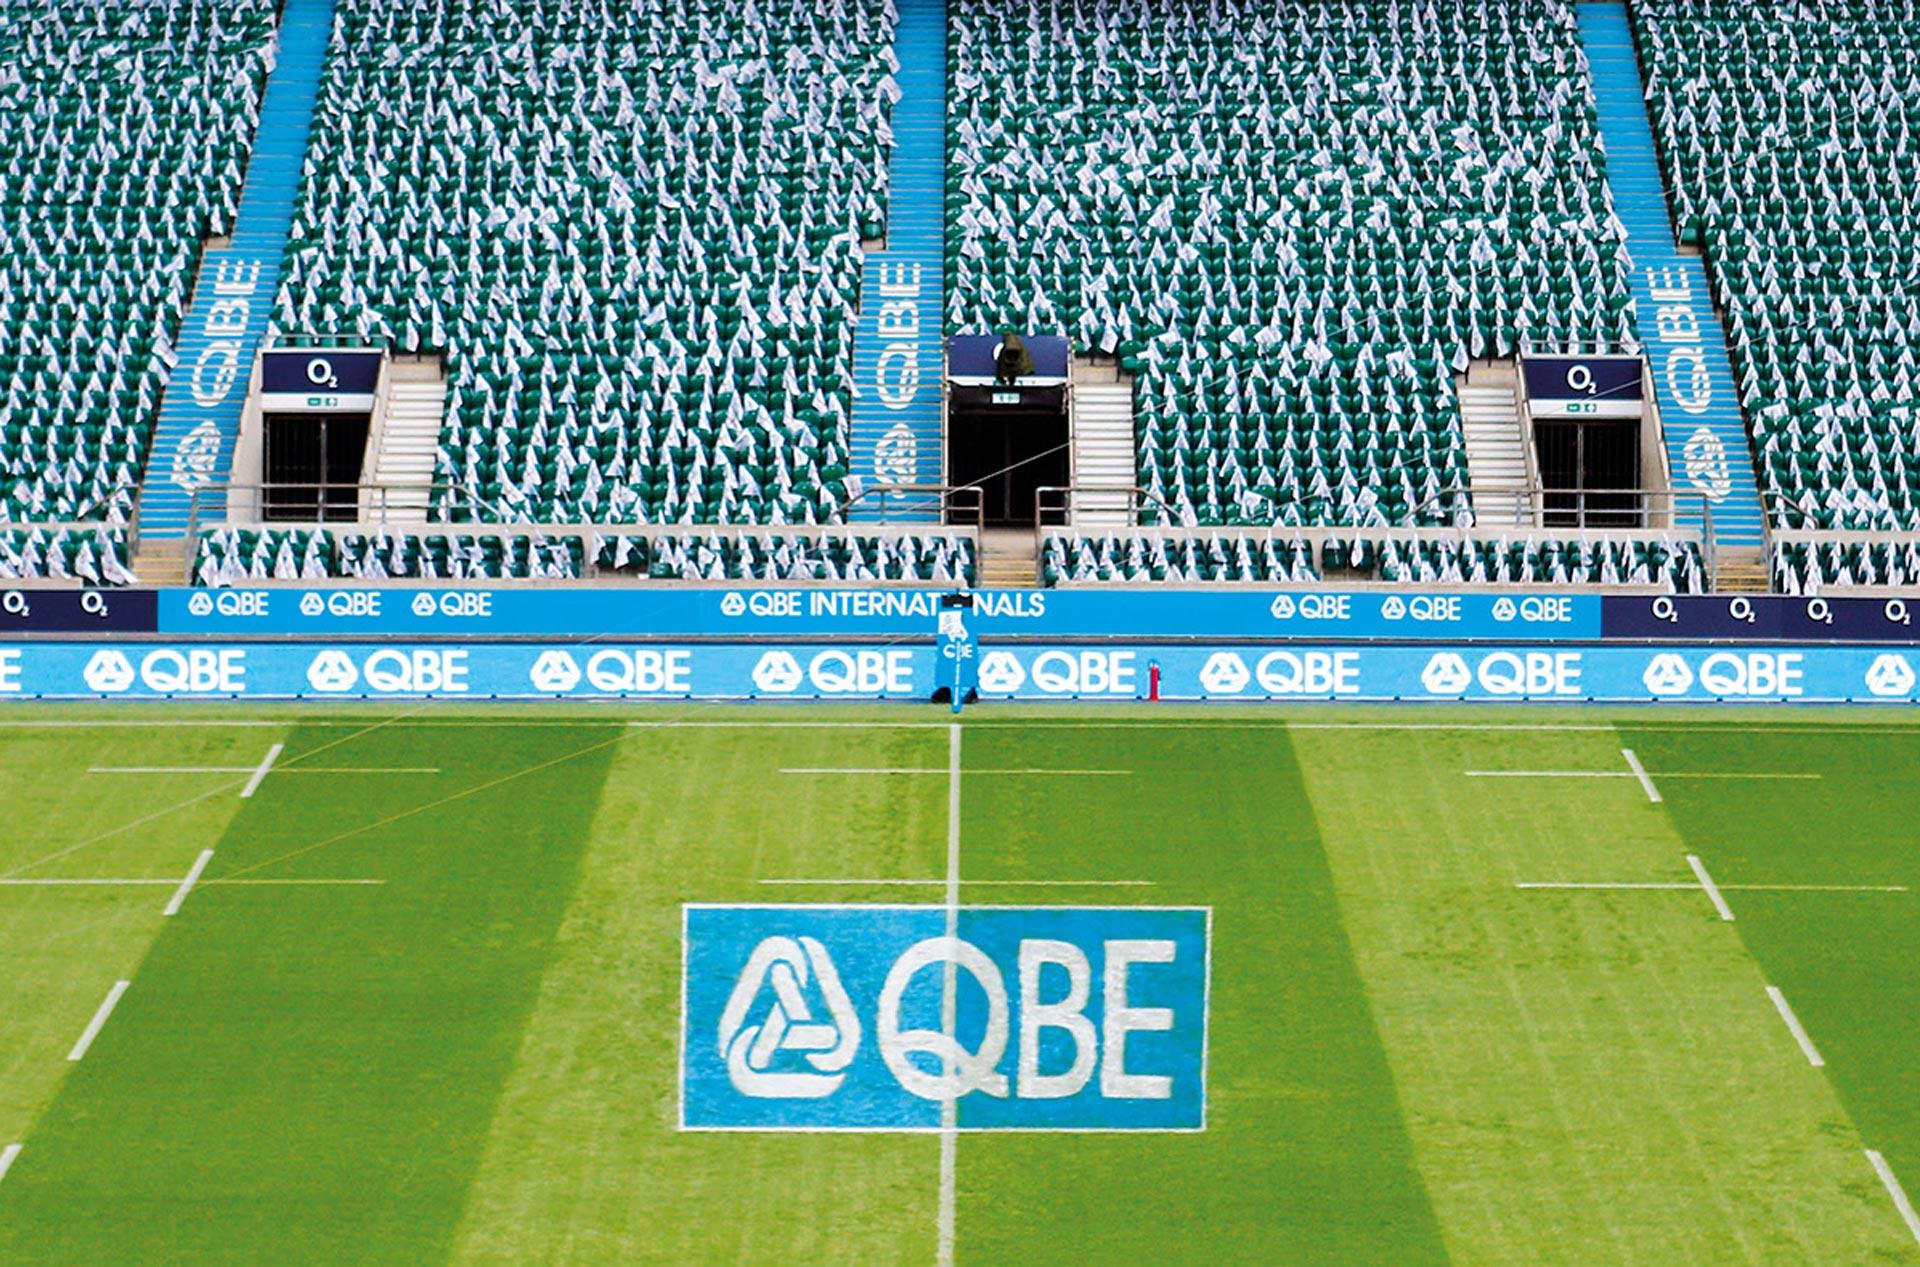 Glendale Creative QBE Internationals Rugby Twickenham Bowl Pitch Markings